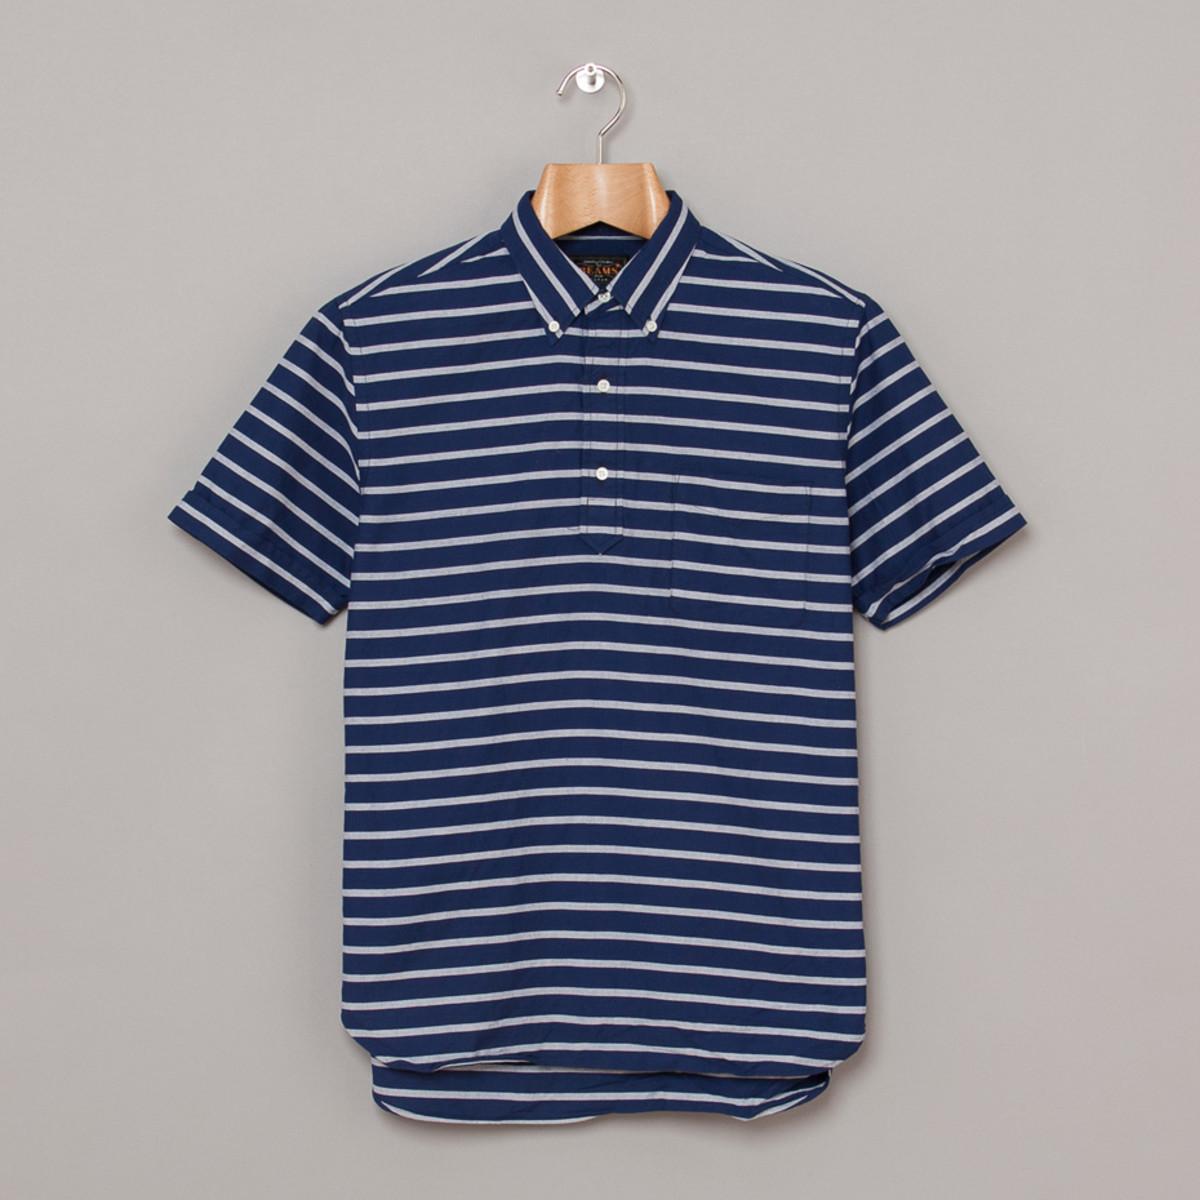 beams-plus-ss-button-down-border-shirt-navy